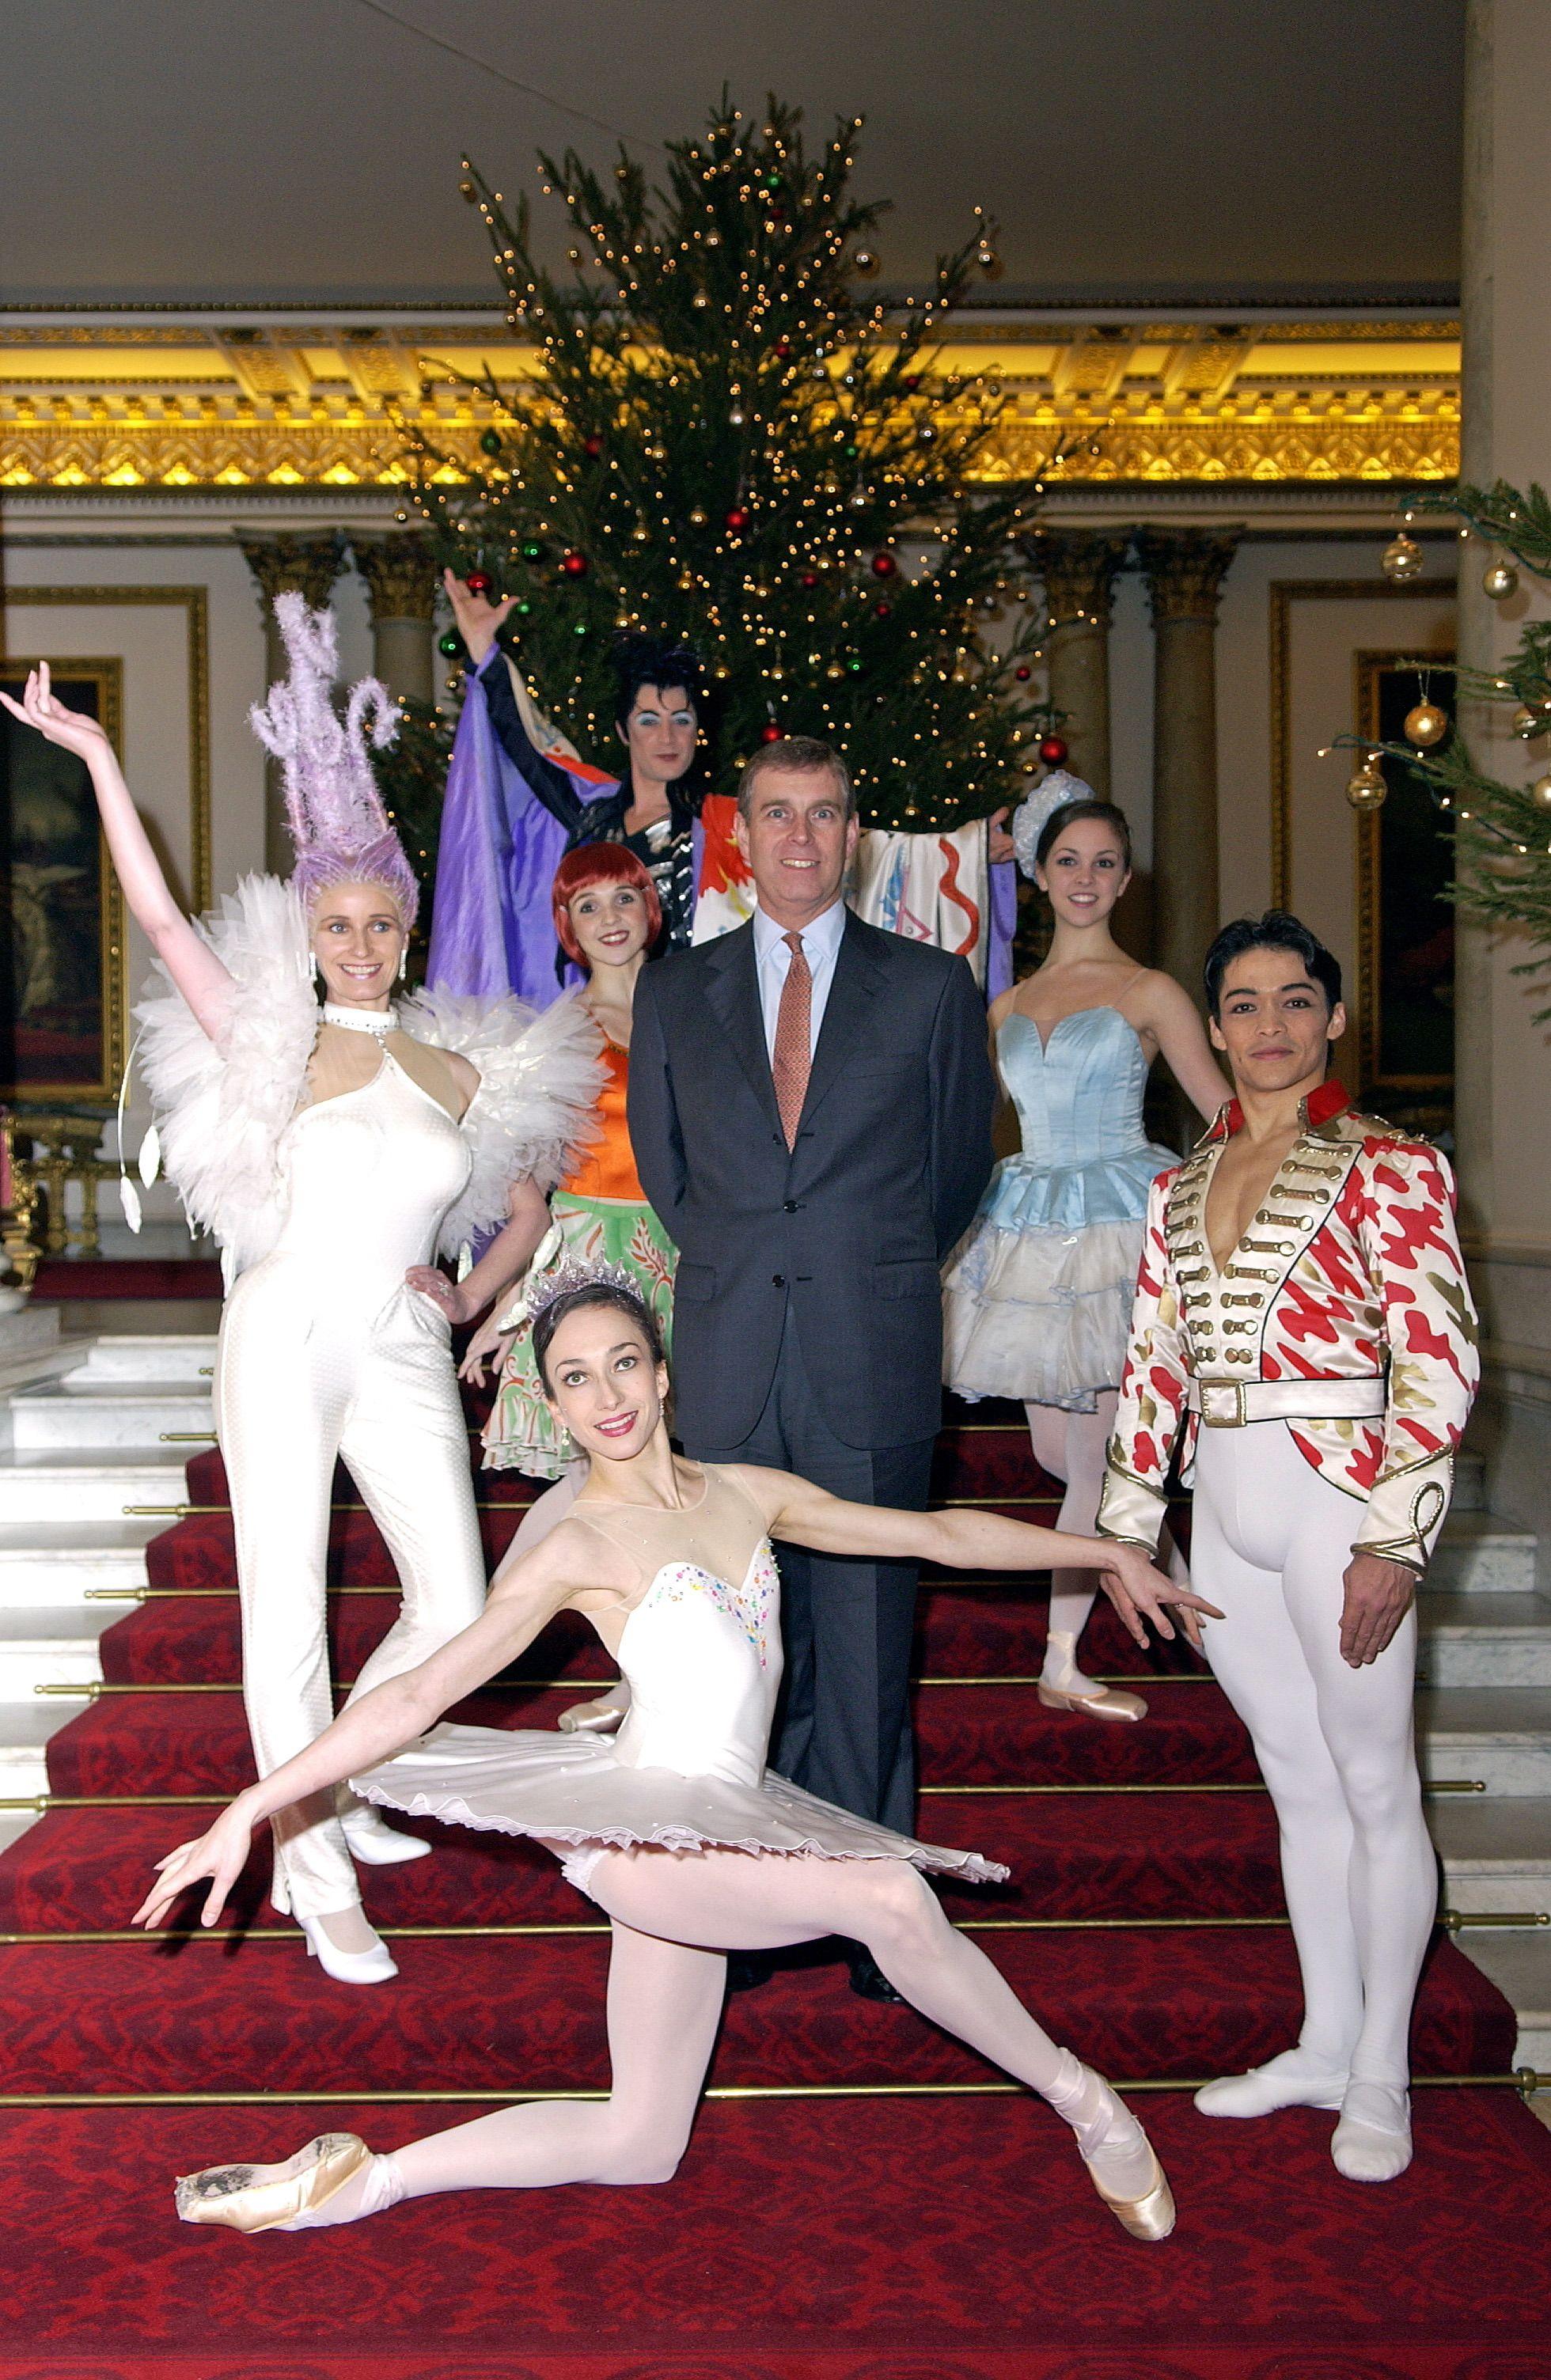 42 photos of the royal family celebrating christmas princess diana queen elizabeth at christmas the royal family celebrating christmas